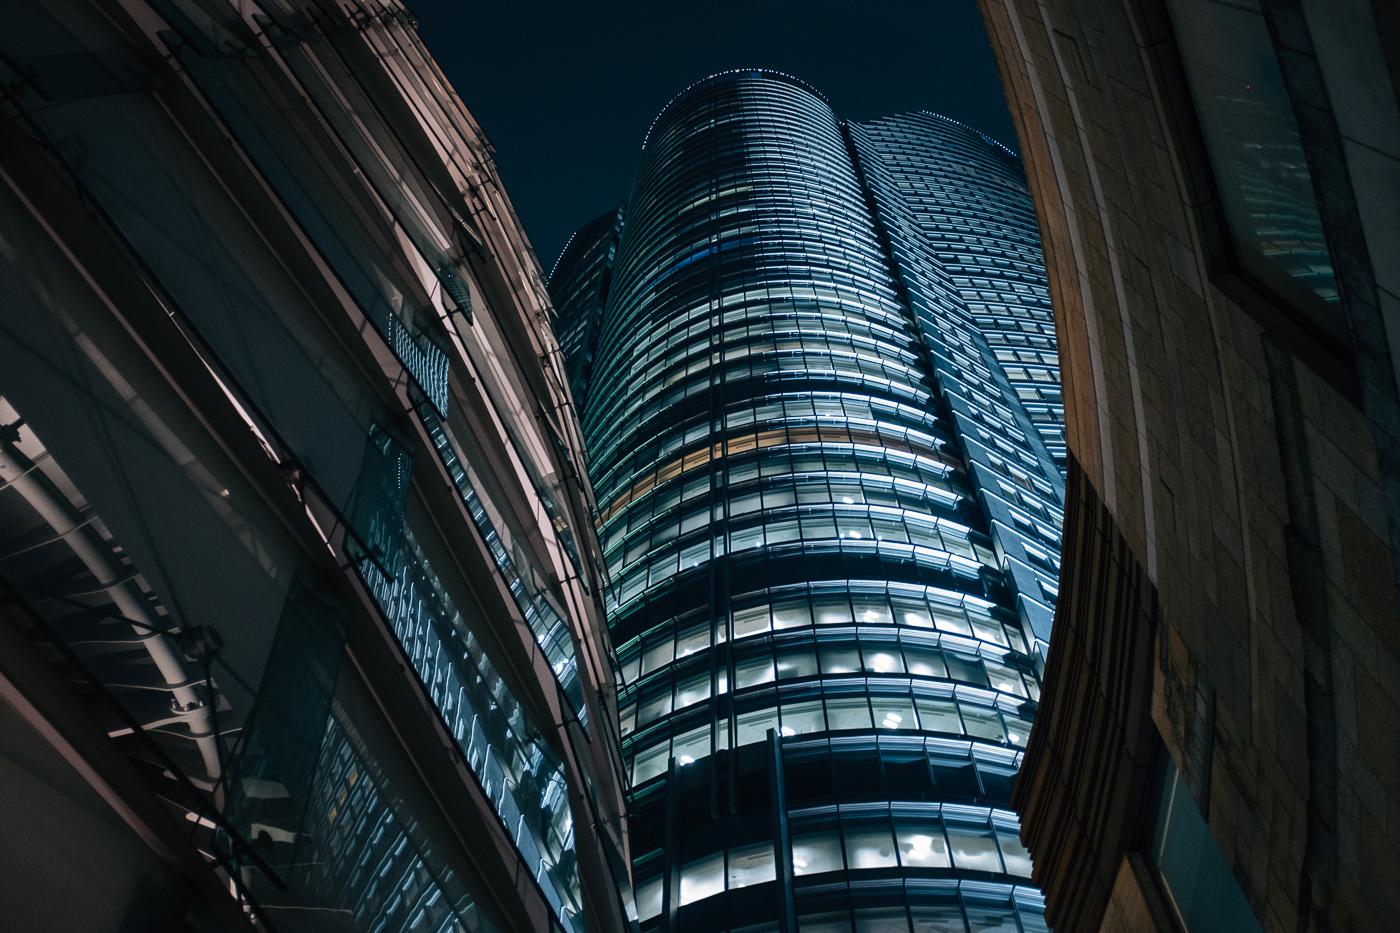 Roppongi et son architecture vertigineuse, en plein coeur de Tokyo